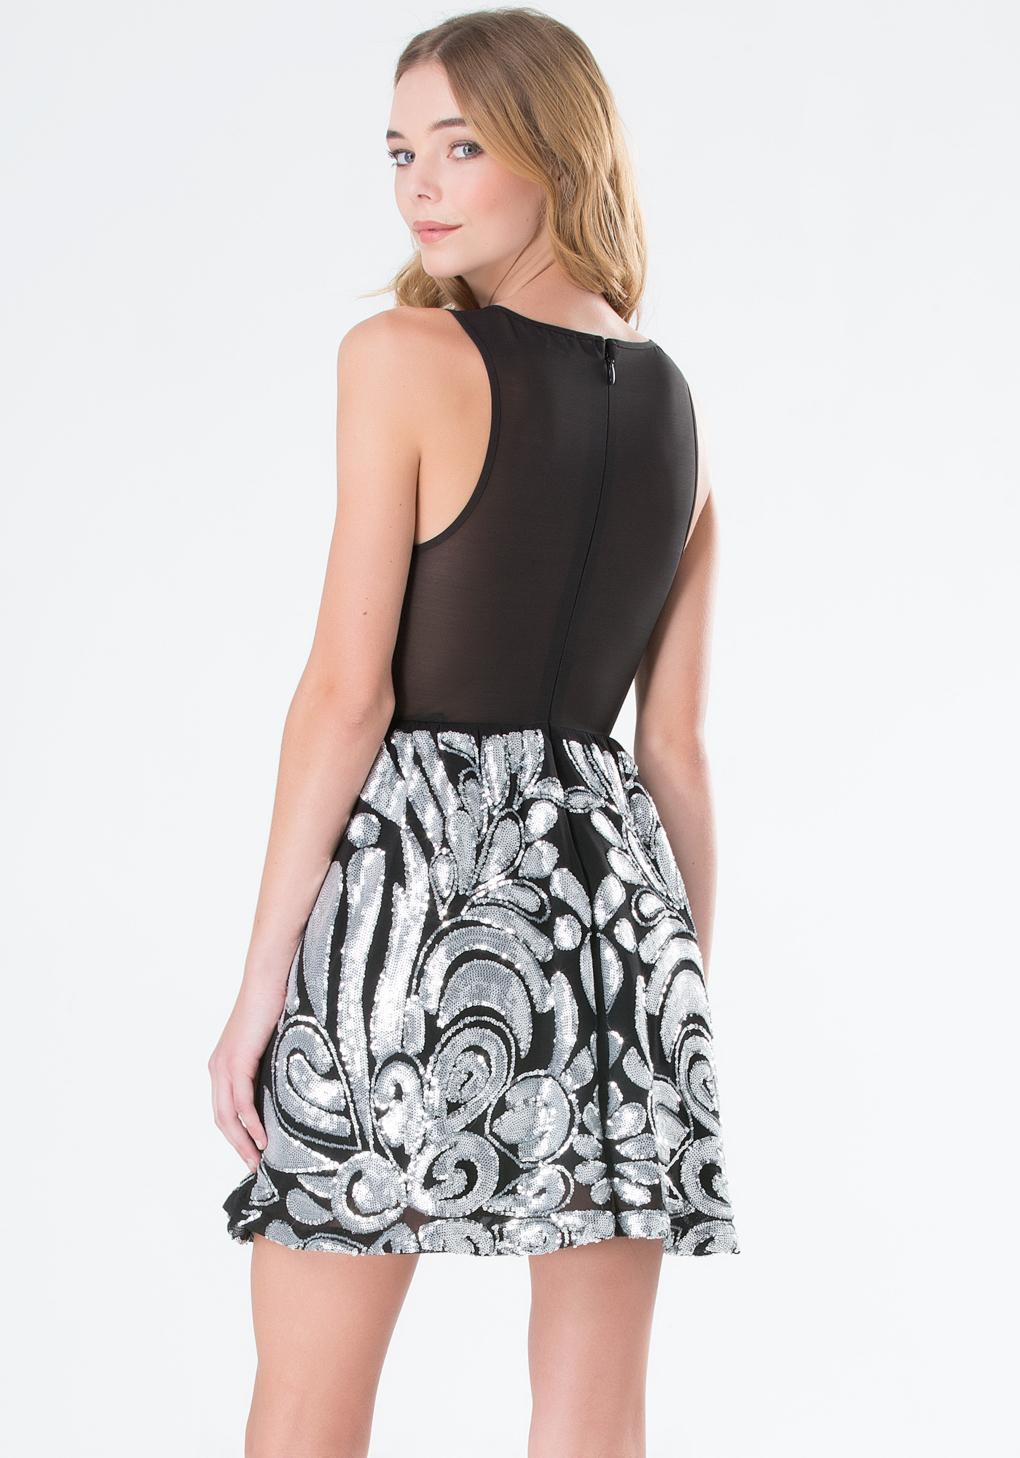 Bebe Melina Sequin & Mesh Dress in Black | Lyst